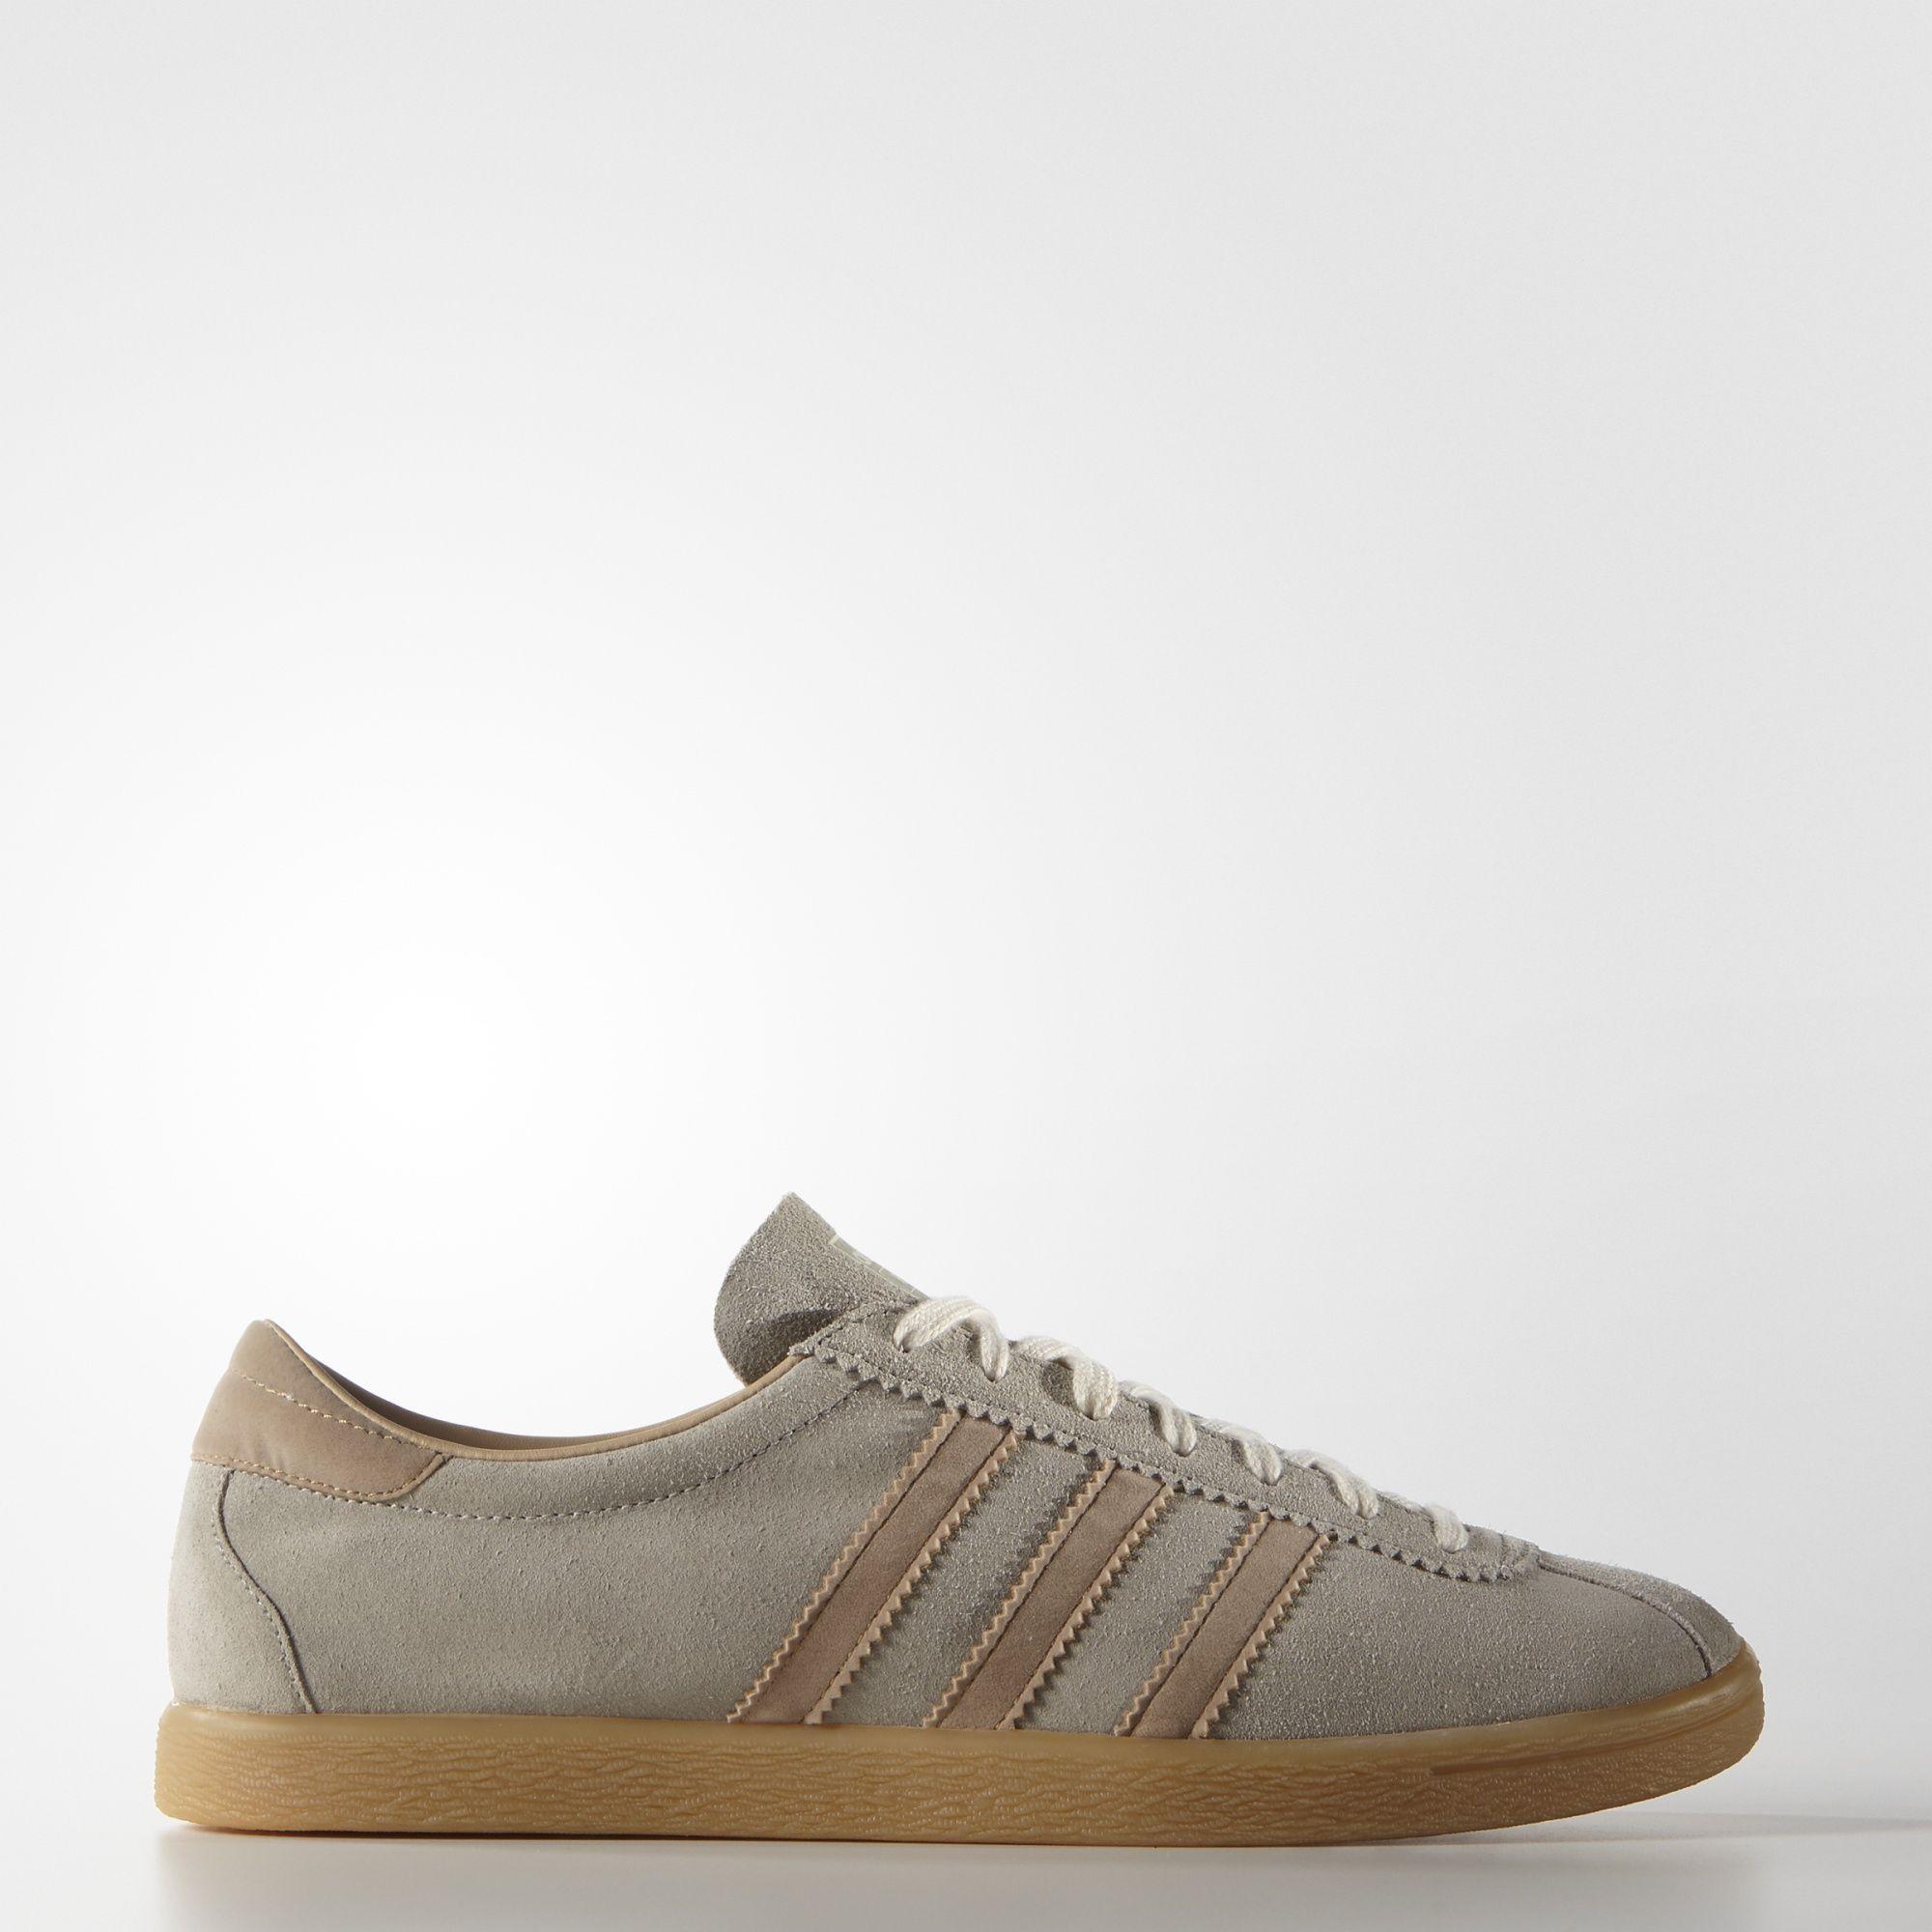 adidas - Tobacco Riviera Shoes